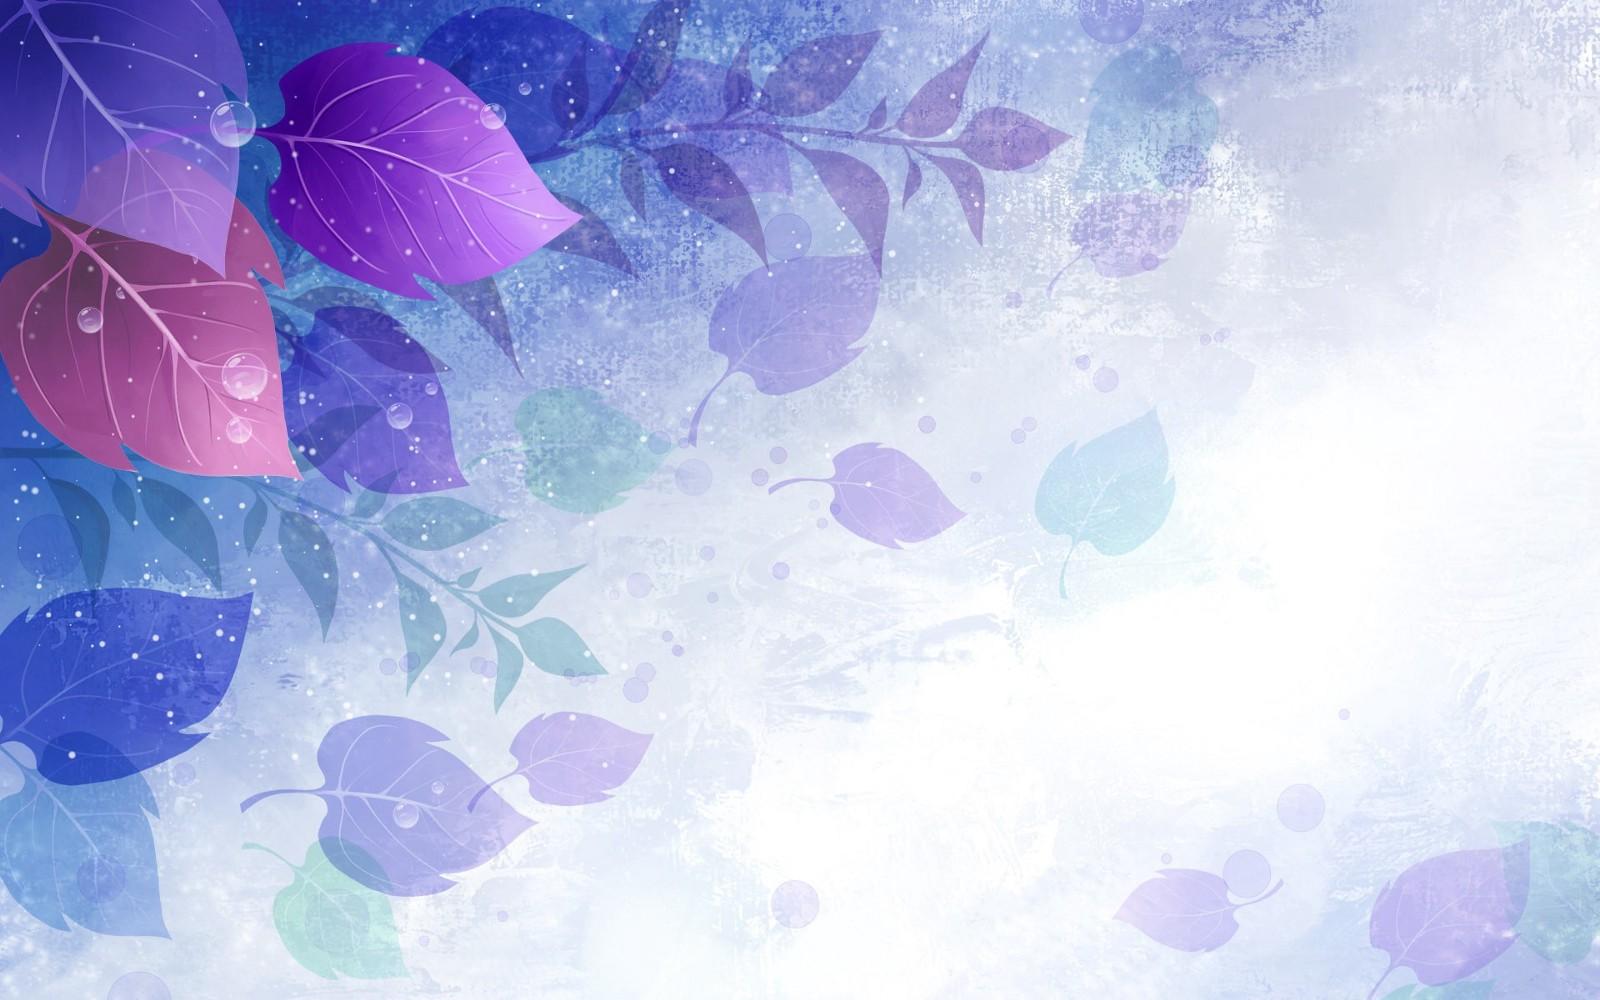 Background hoa lá màu tím